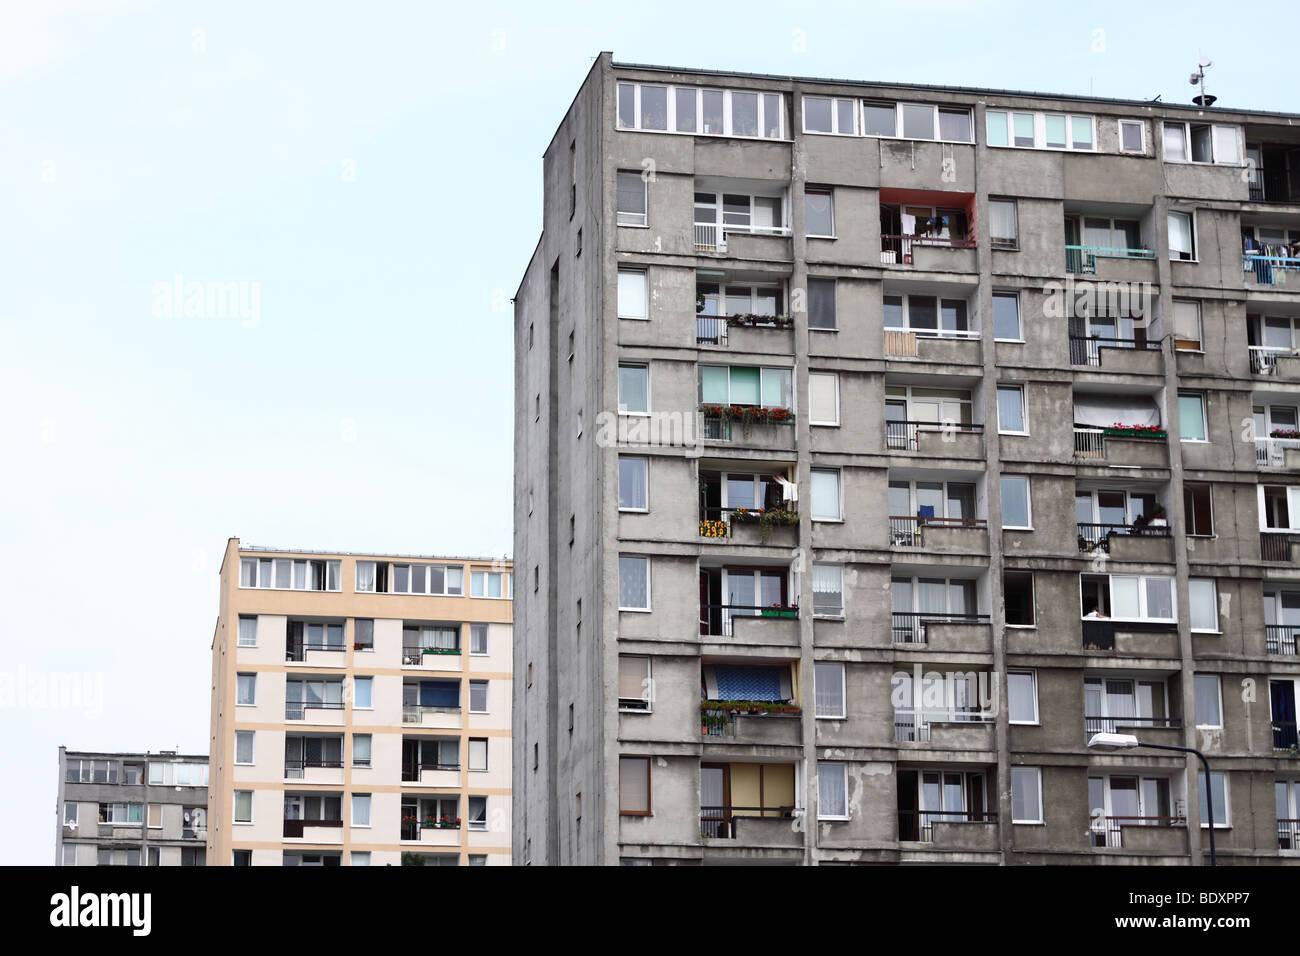 hight resolution of warsaw poland old style communist era public housing concrete flats note renovated bloc behind taken summer